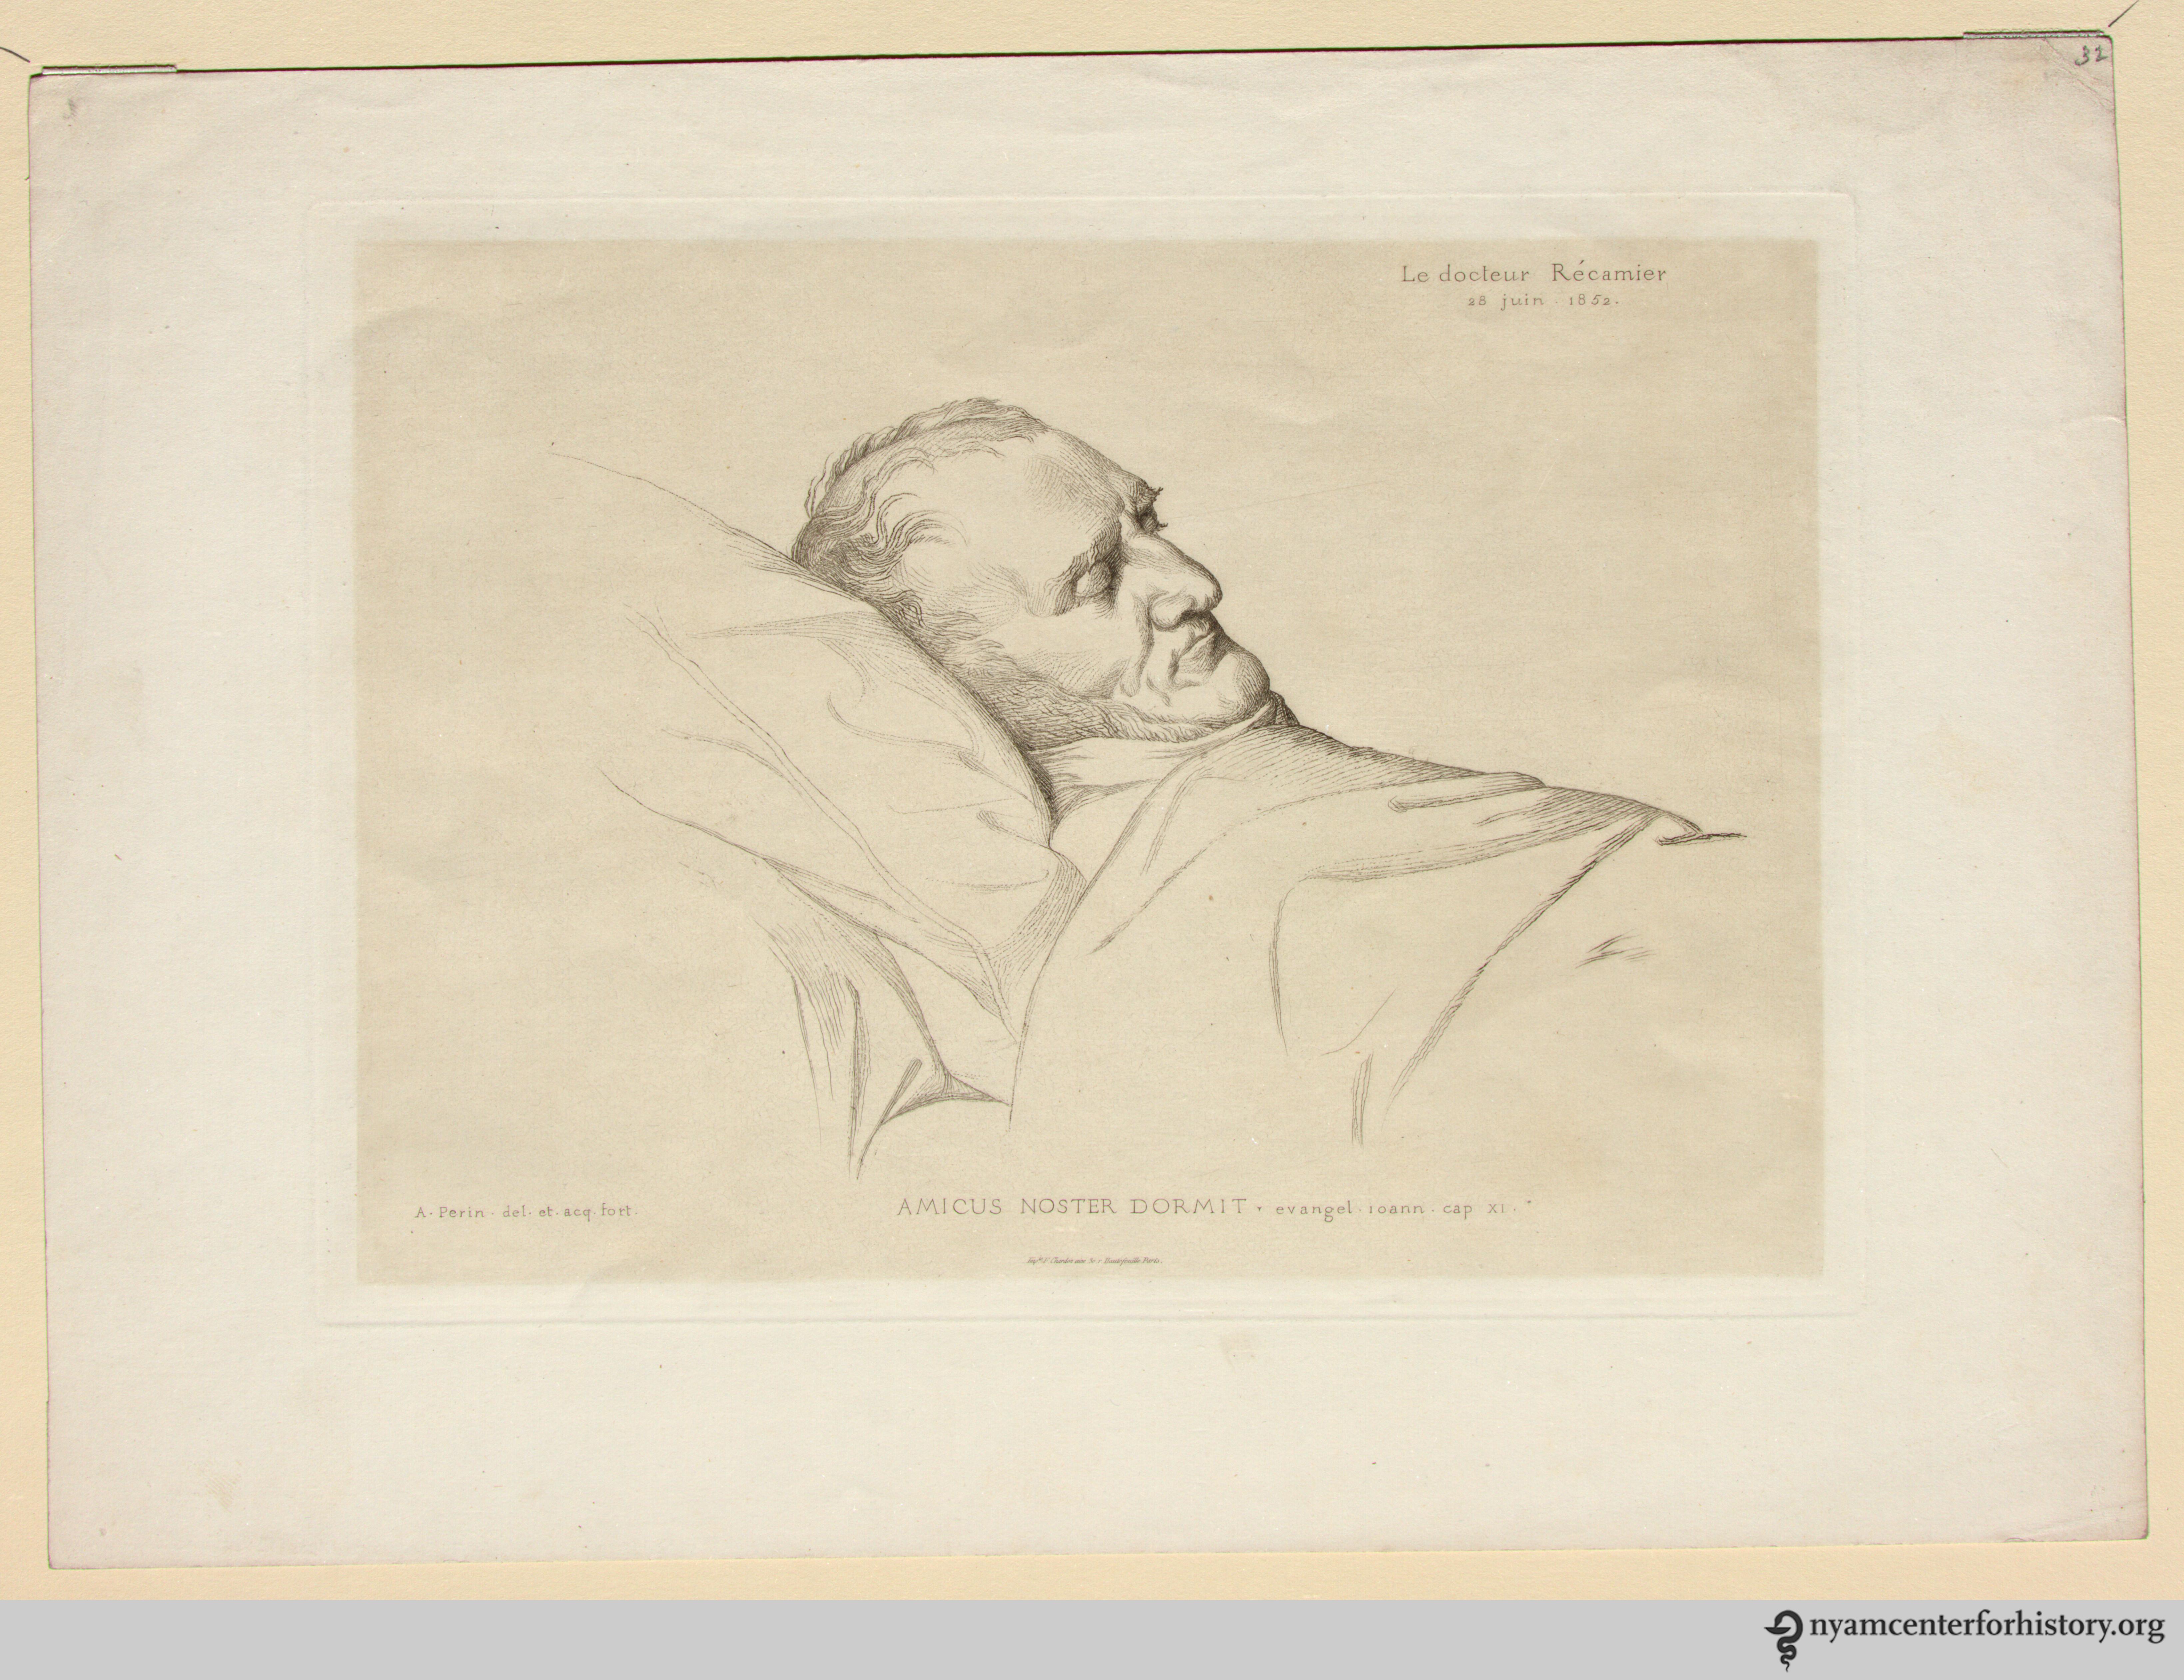 Récamier, Joseph Claude Anthelme. Example of a lithograph